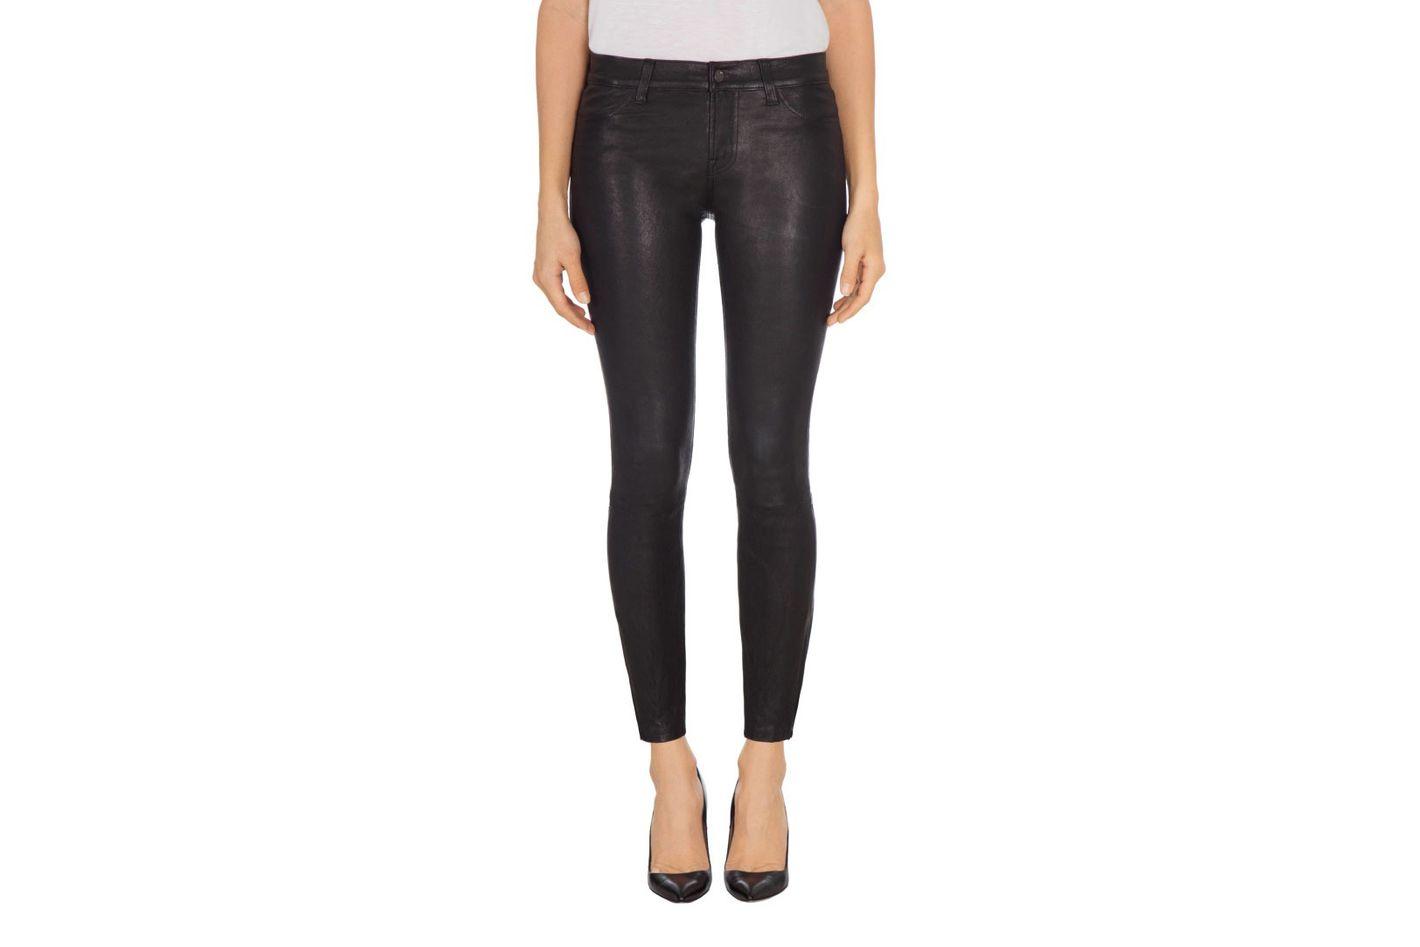 Mid-Rise Super Skinny Legging in Leather Noir